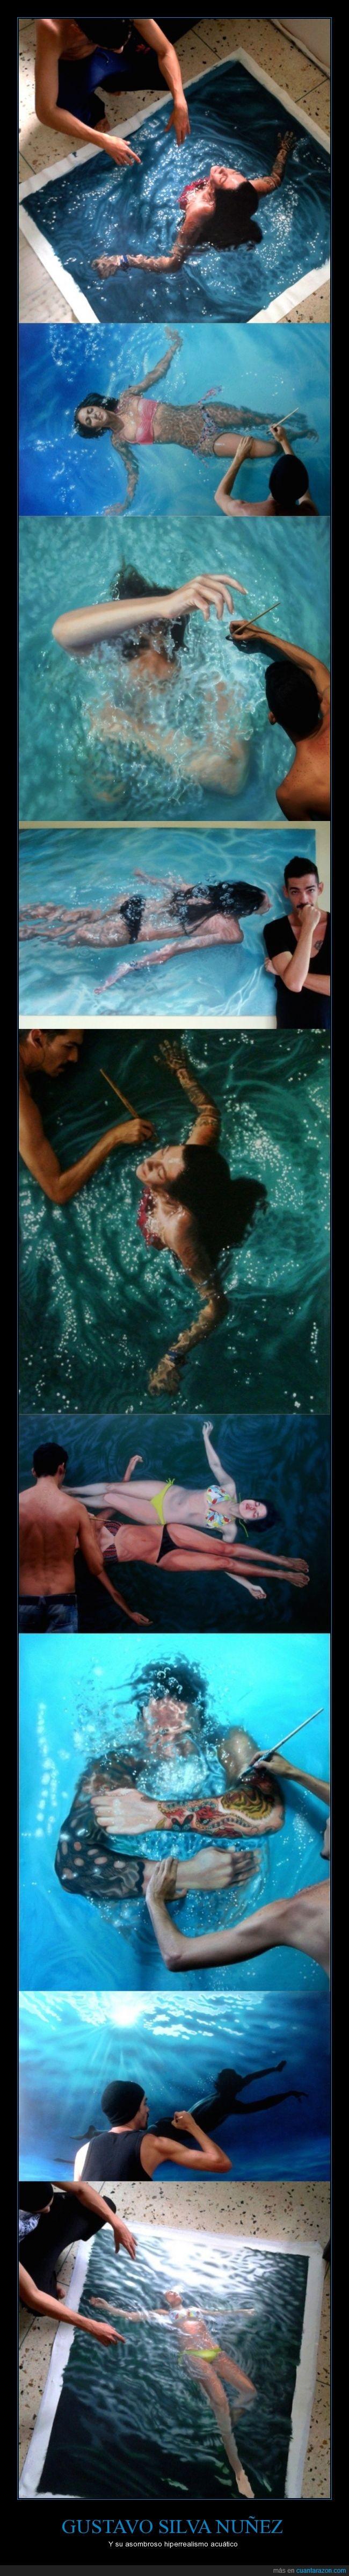 agua,chica,Gustavo Silva Nuñez,hiperrealismo,hiperrealista,mar,piscina